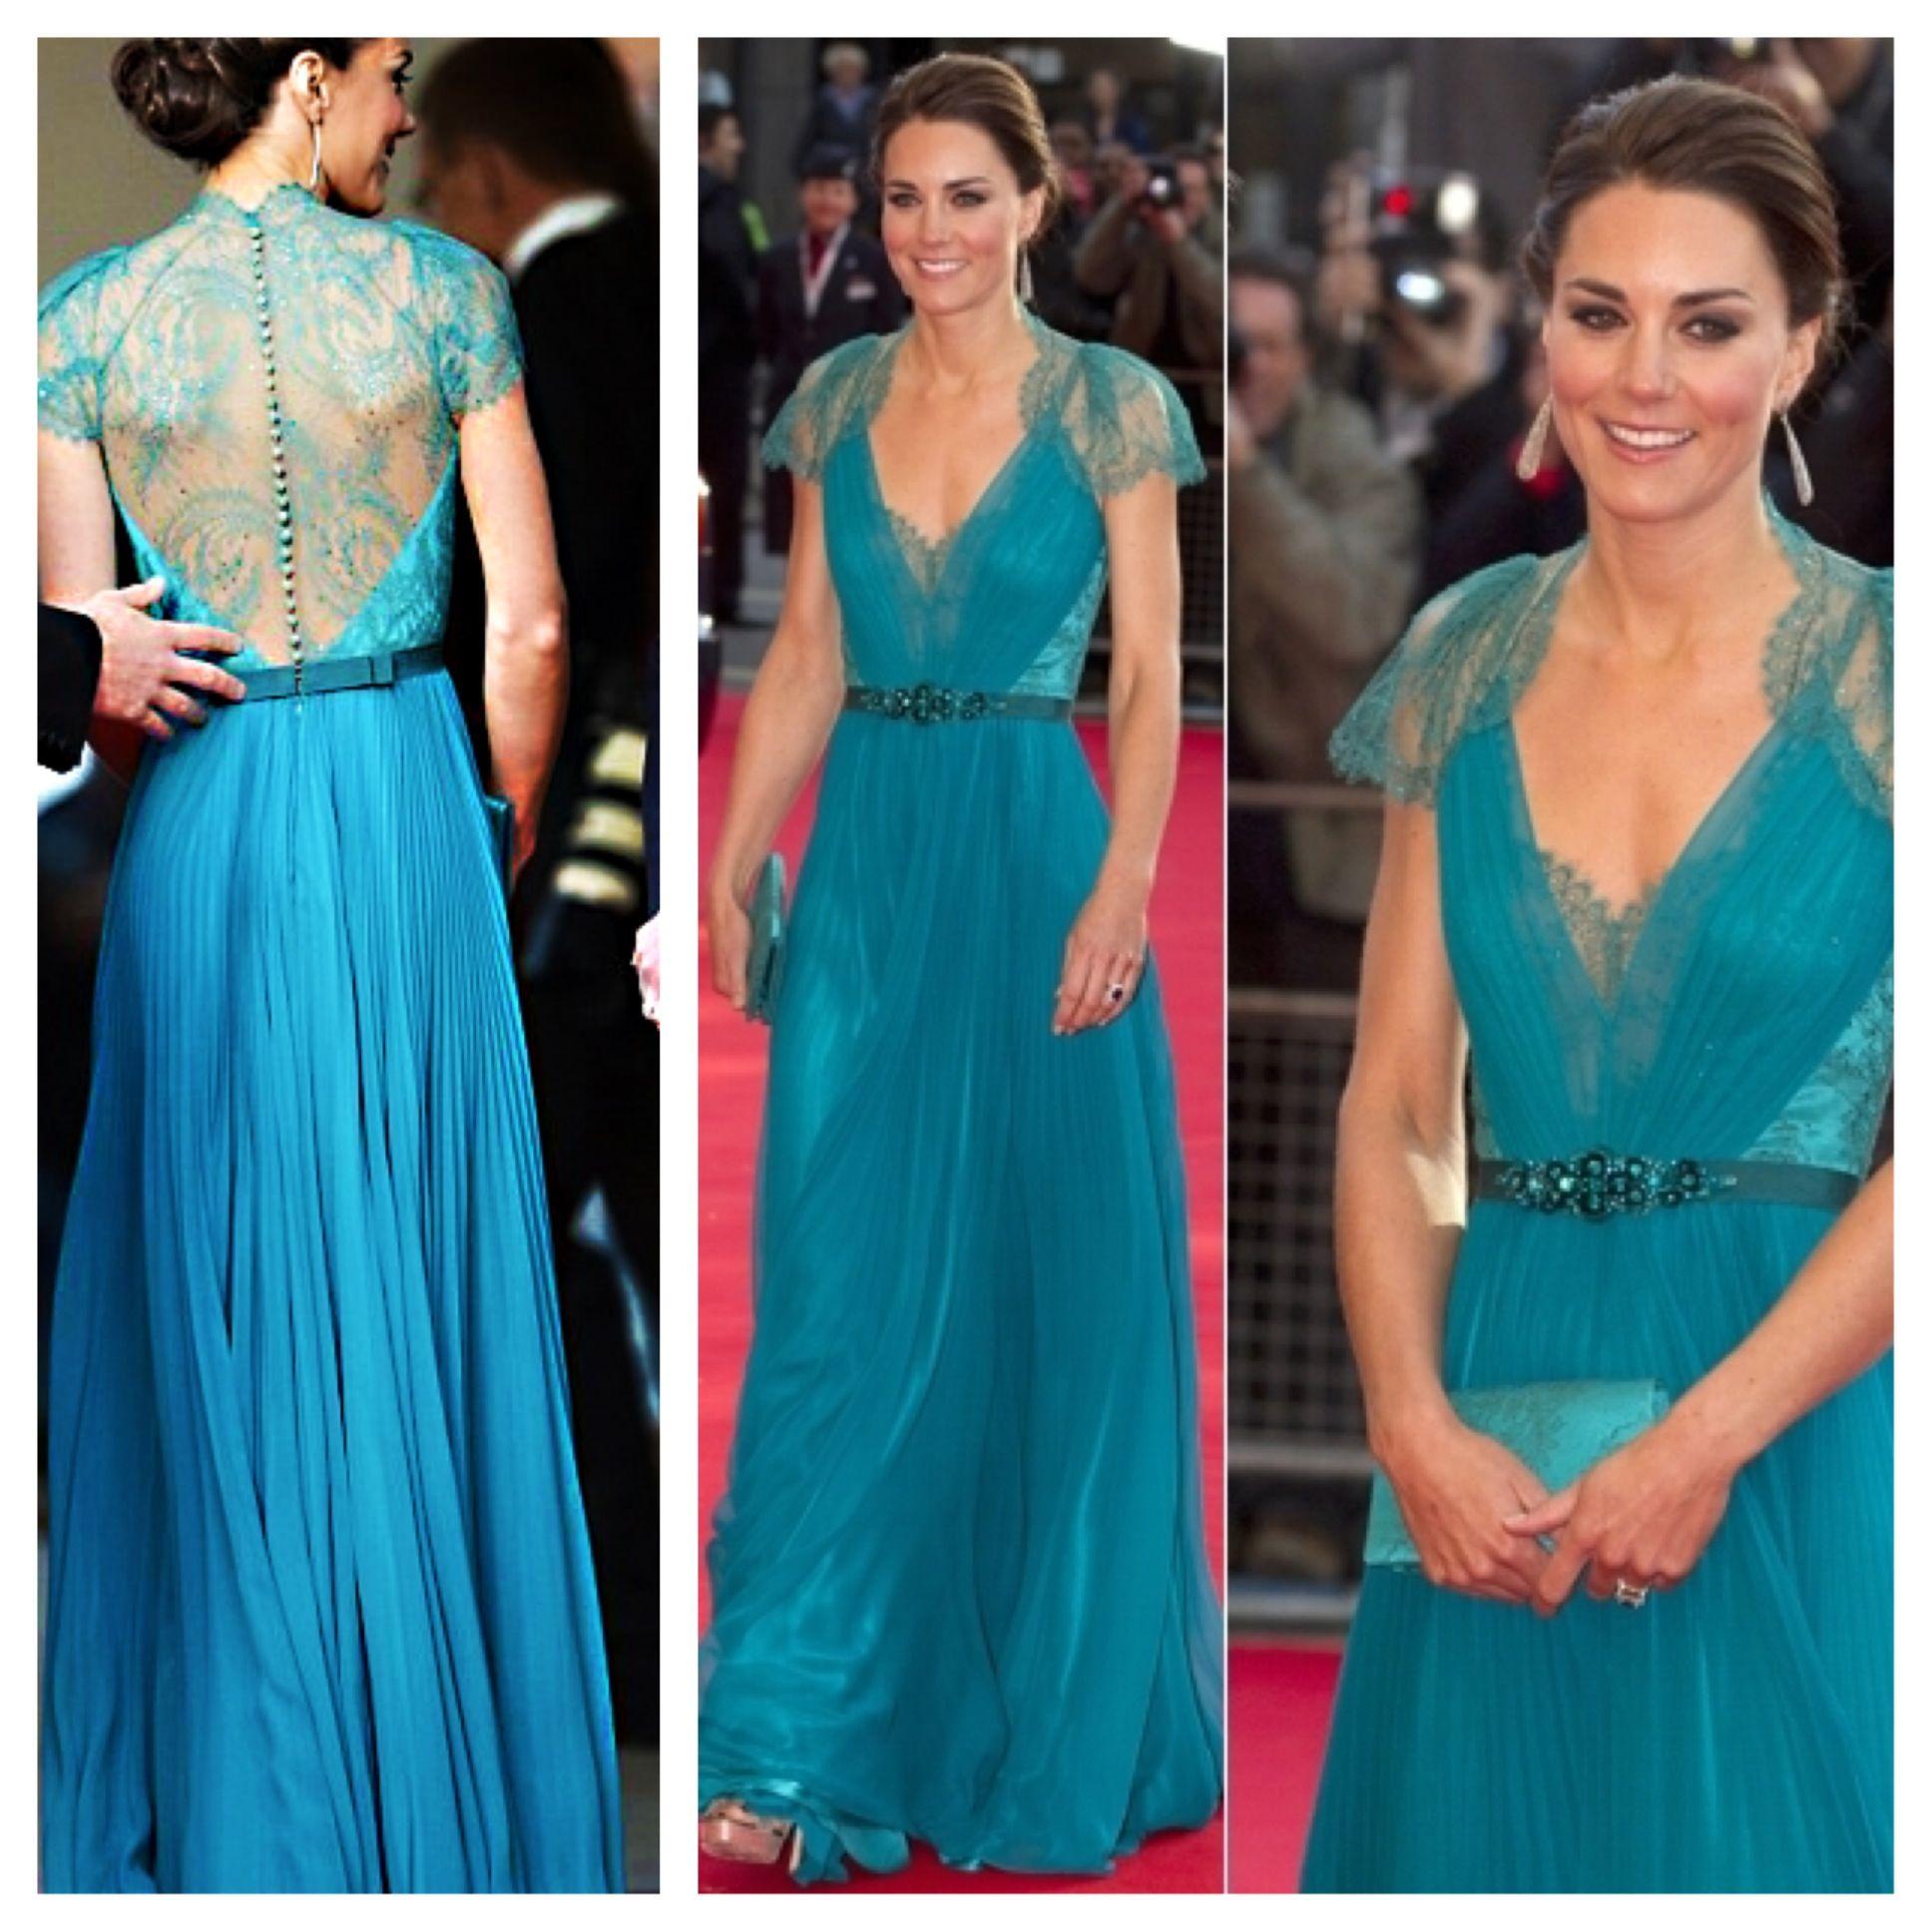 Princes Kate Middleton aqua dress | celeb style watch | Pinterest ...